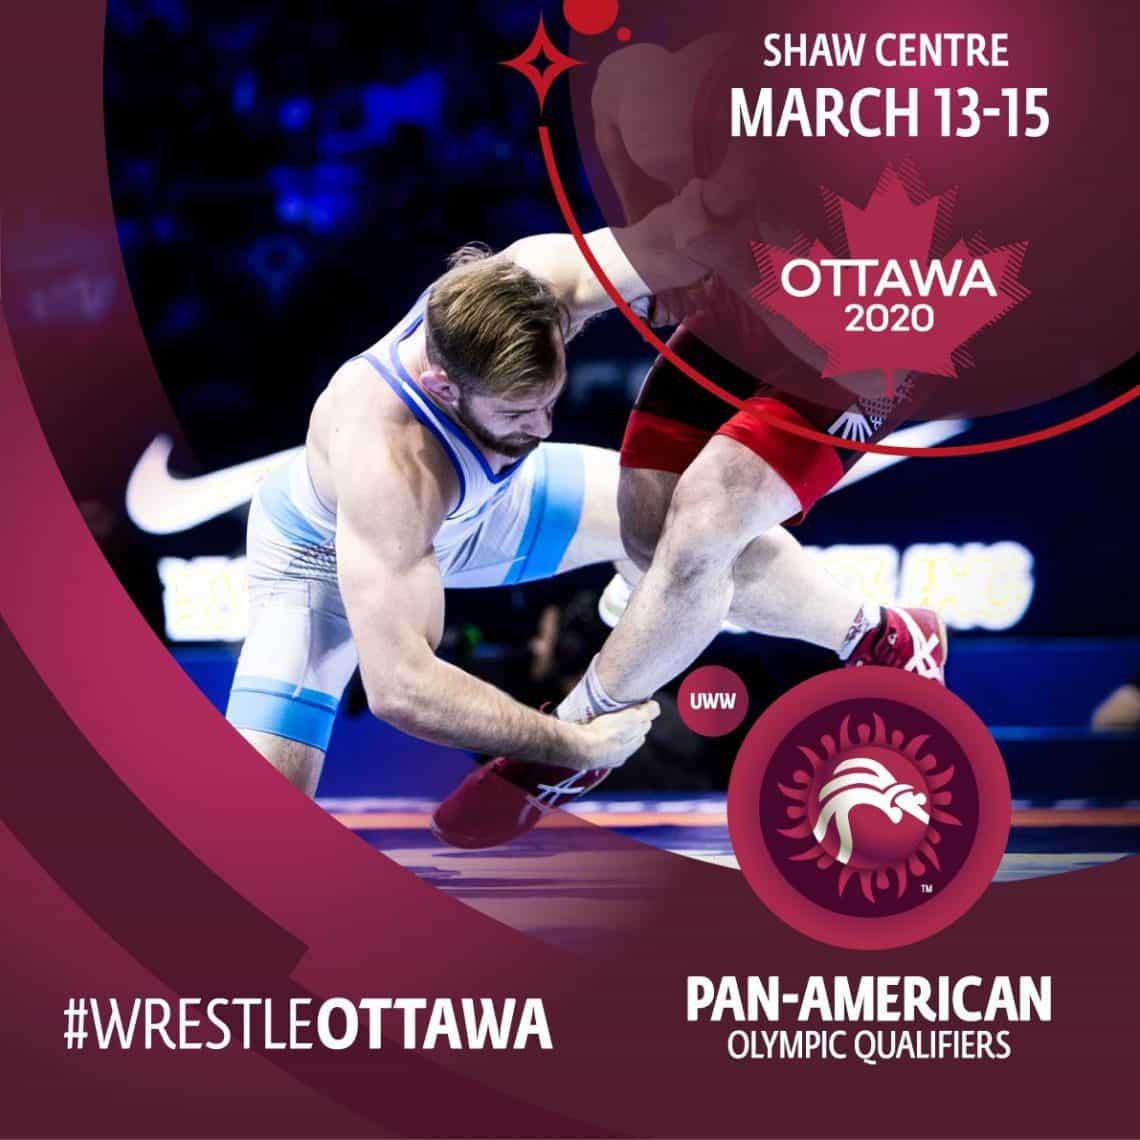 Pan-American OG Qualifier, tutti i risultati delle qualificazioni per le Olimpiadi 1